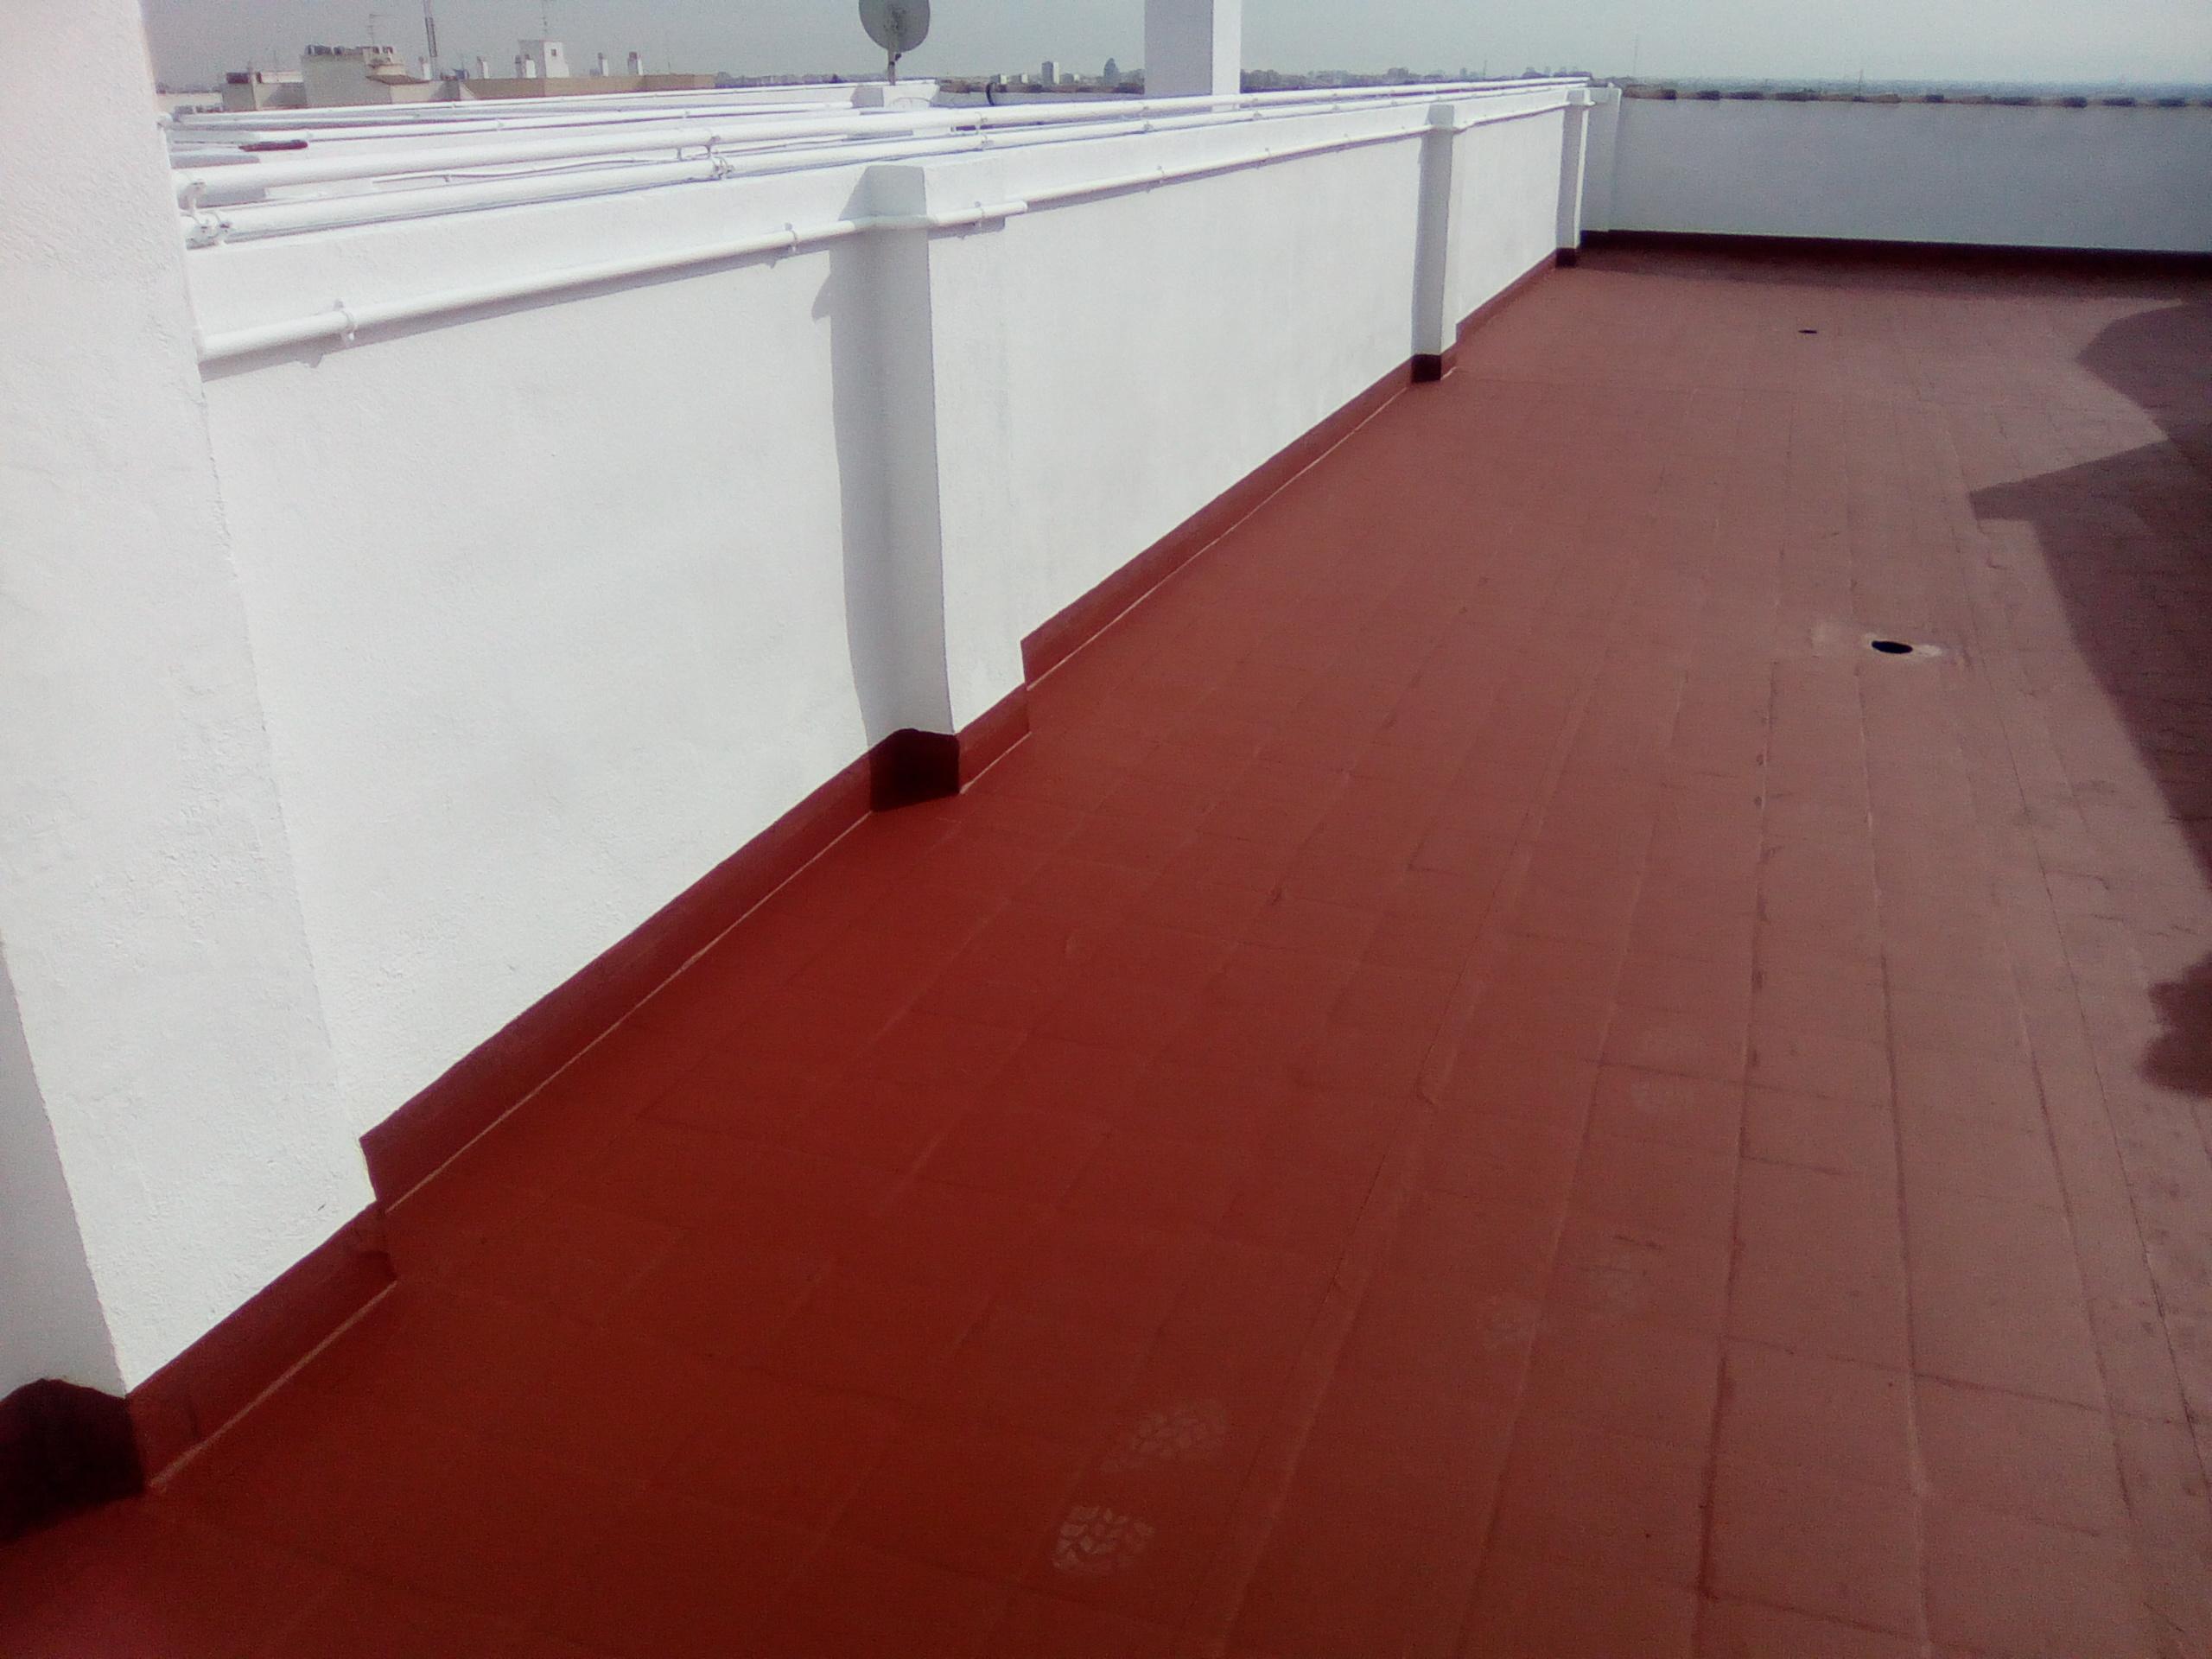 Impertec edifex impermeabilizacion terraza pintura y fibra - Como impermeabilizar una terraza ...